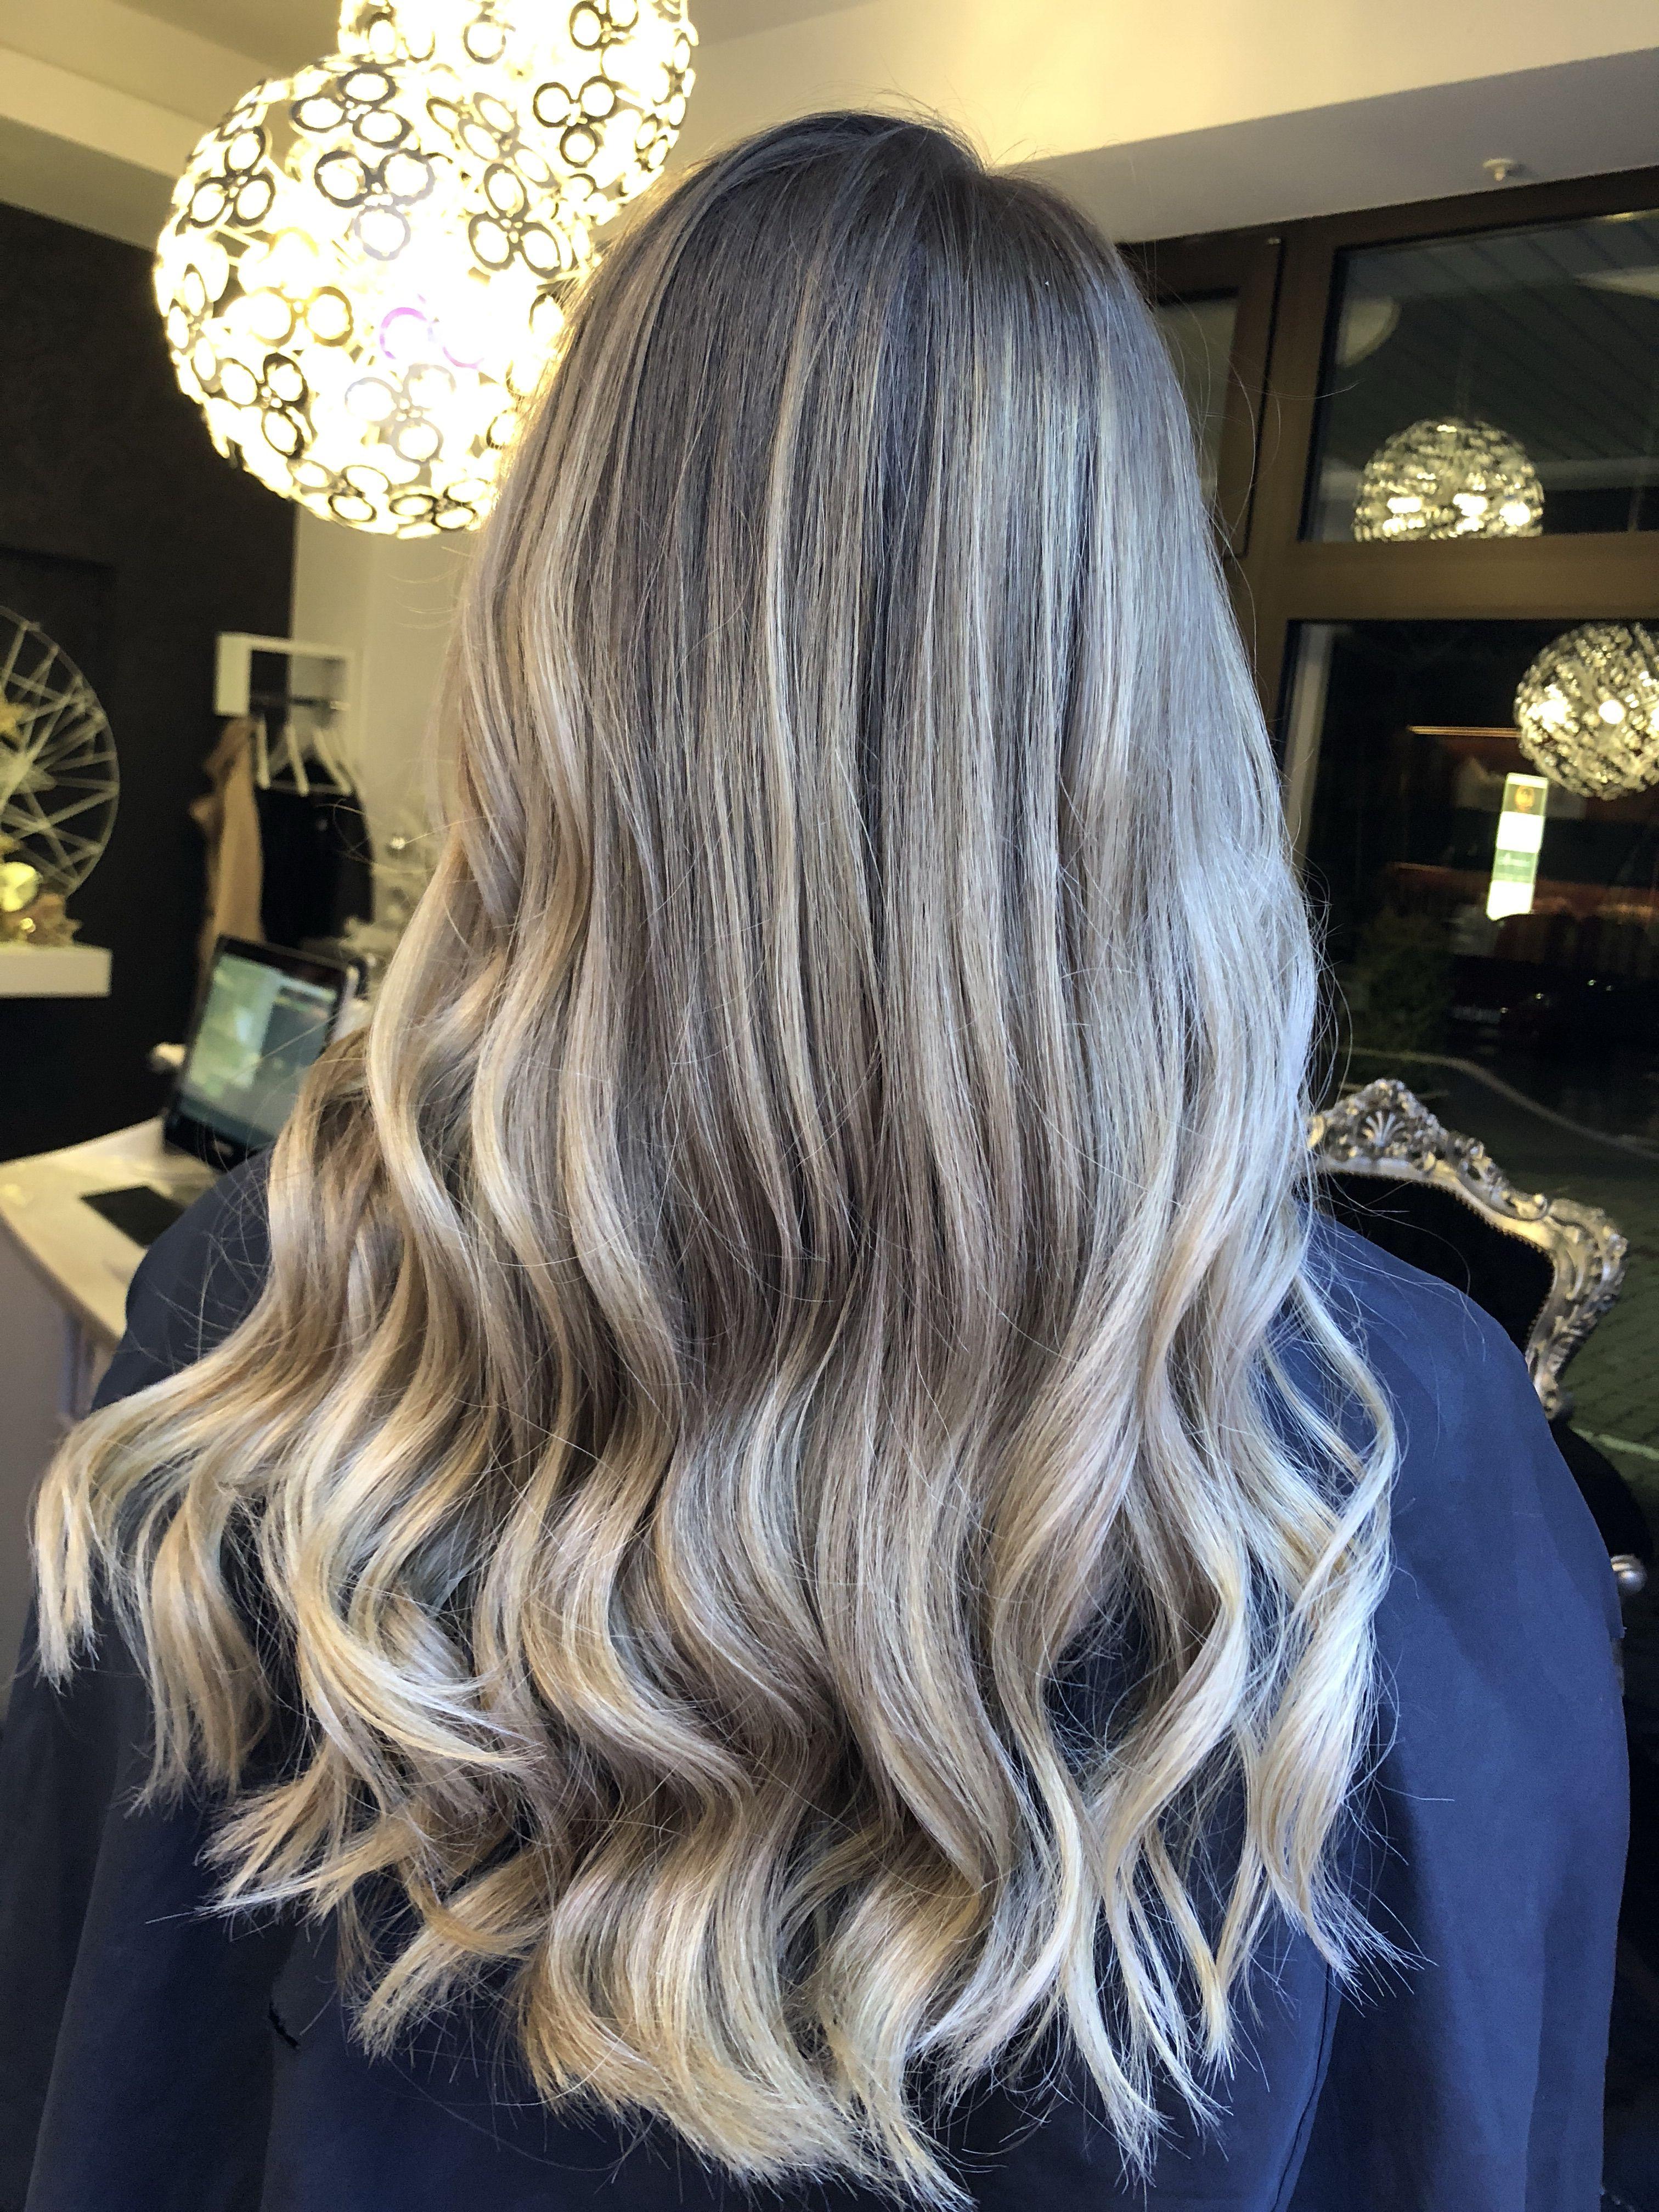 Haartrend 2019 Hairstyle 2019 Lange Haare Blonde Haare Balayage